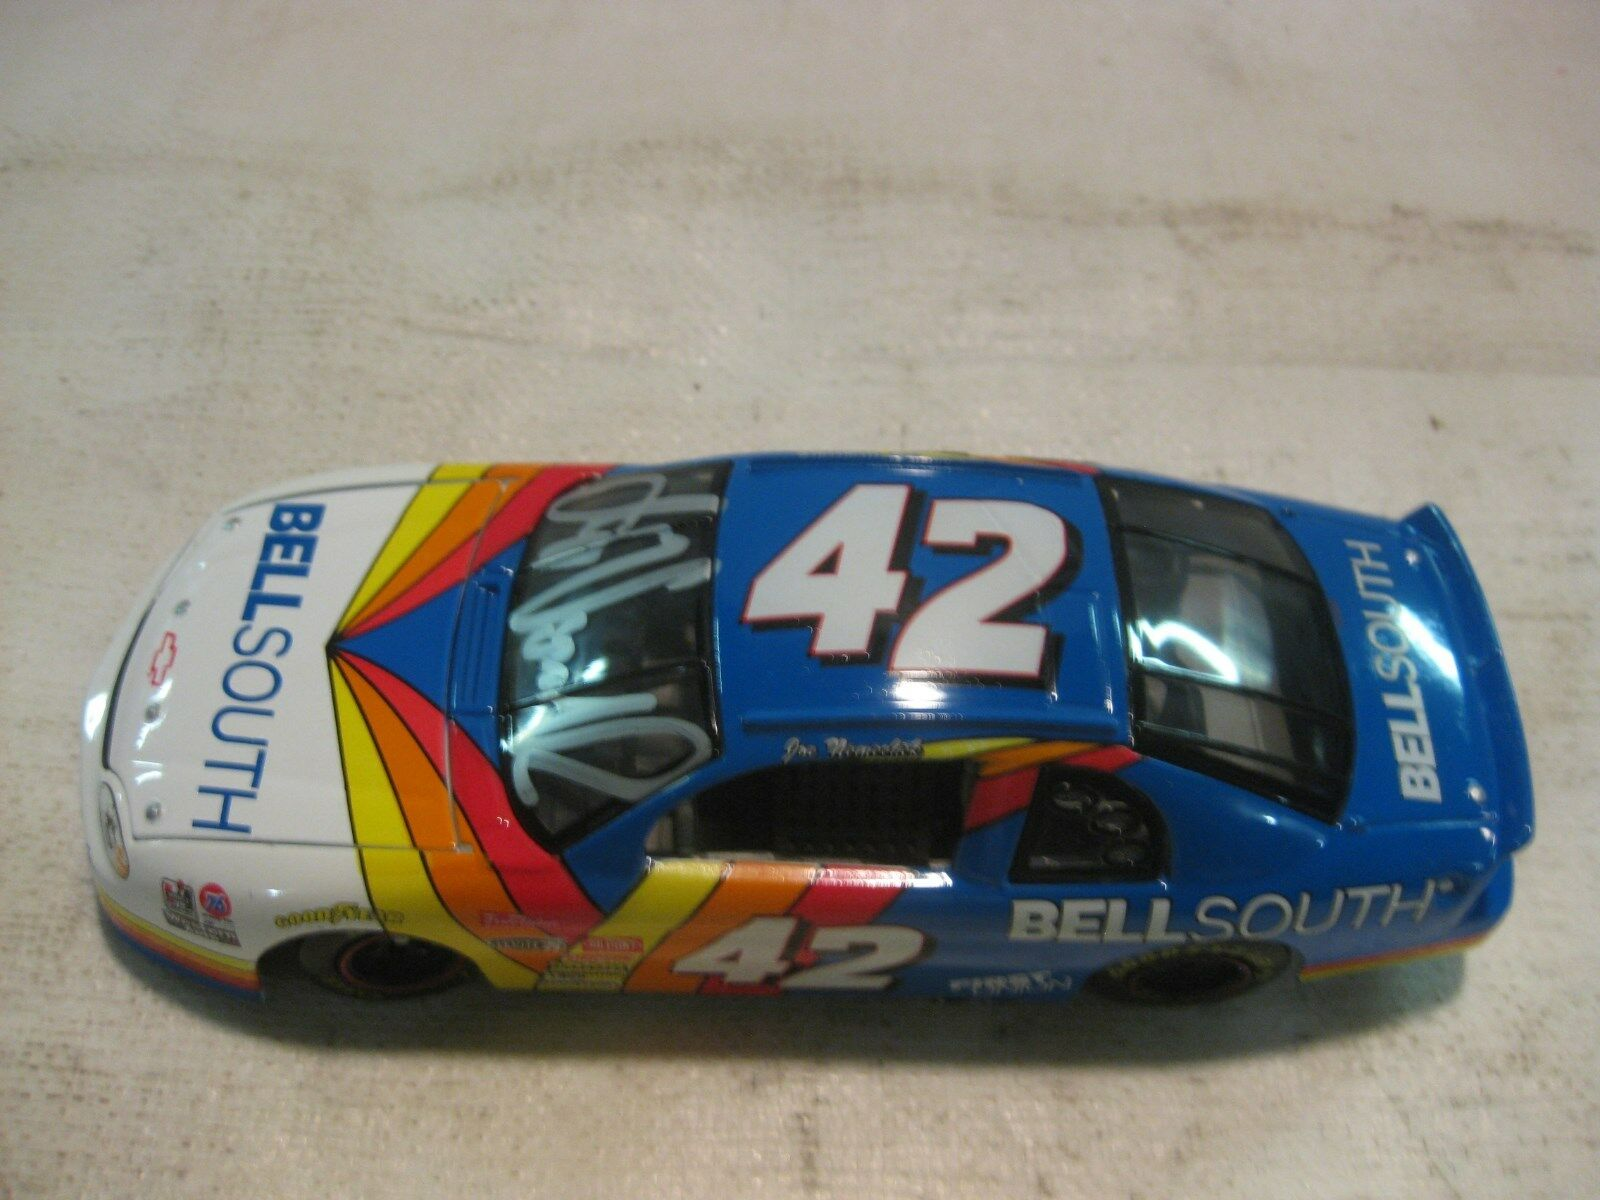 Nascar Signed Joe Nemechek Bell South Chevy 1 24 Scale Diecast Revell 1997